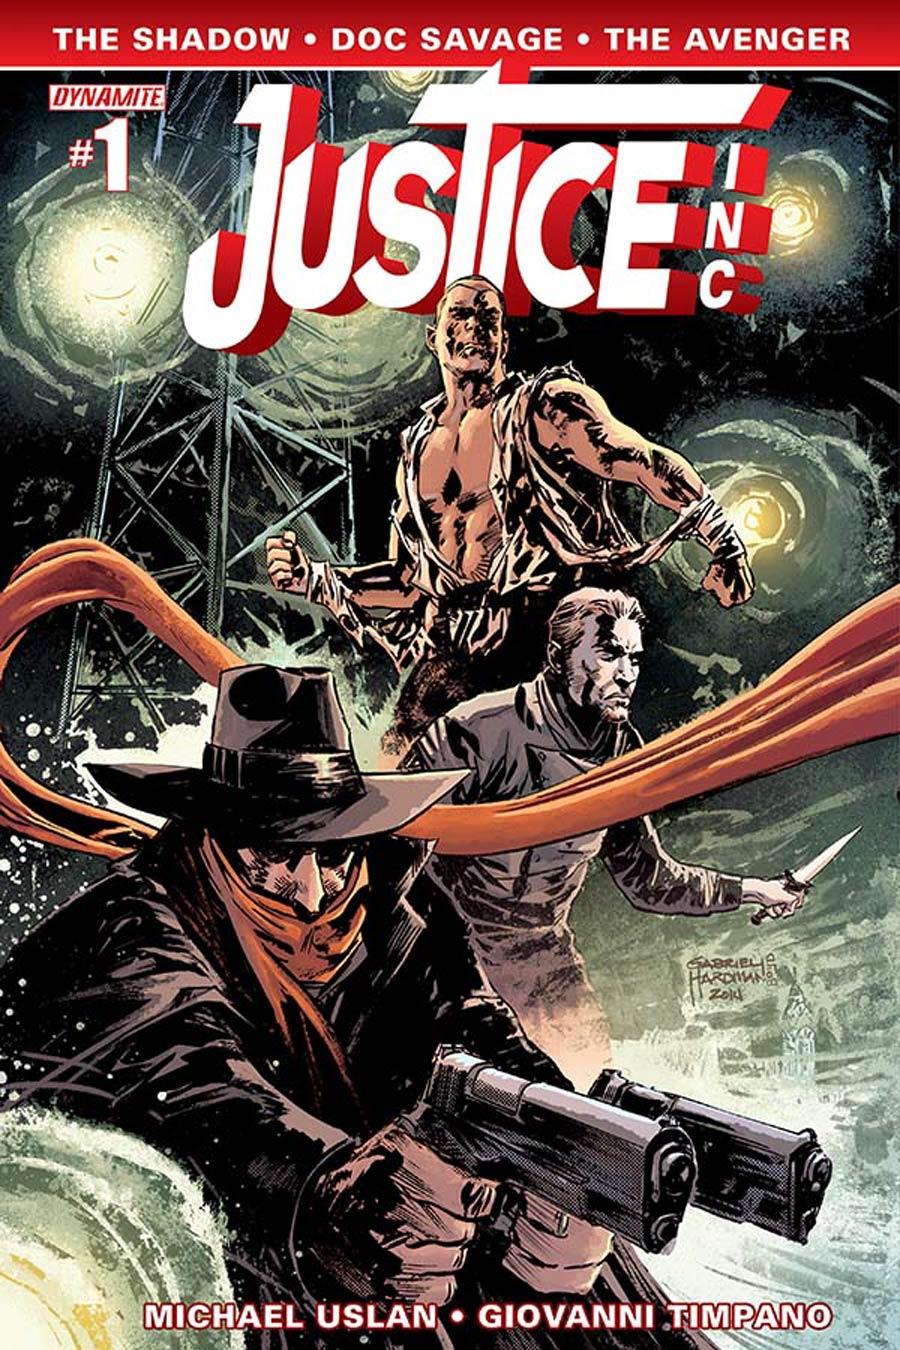 Justice Inc Vol 3 #1 Cover C Variant Gabriel Hardman Cover